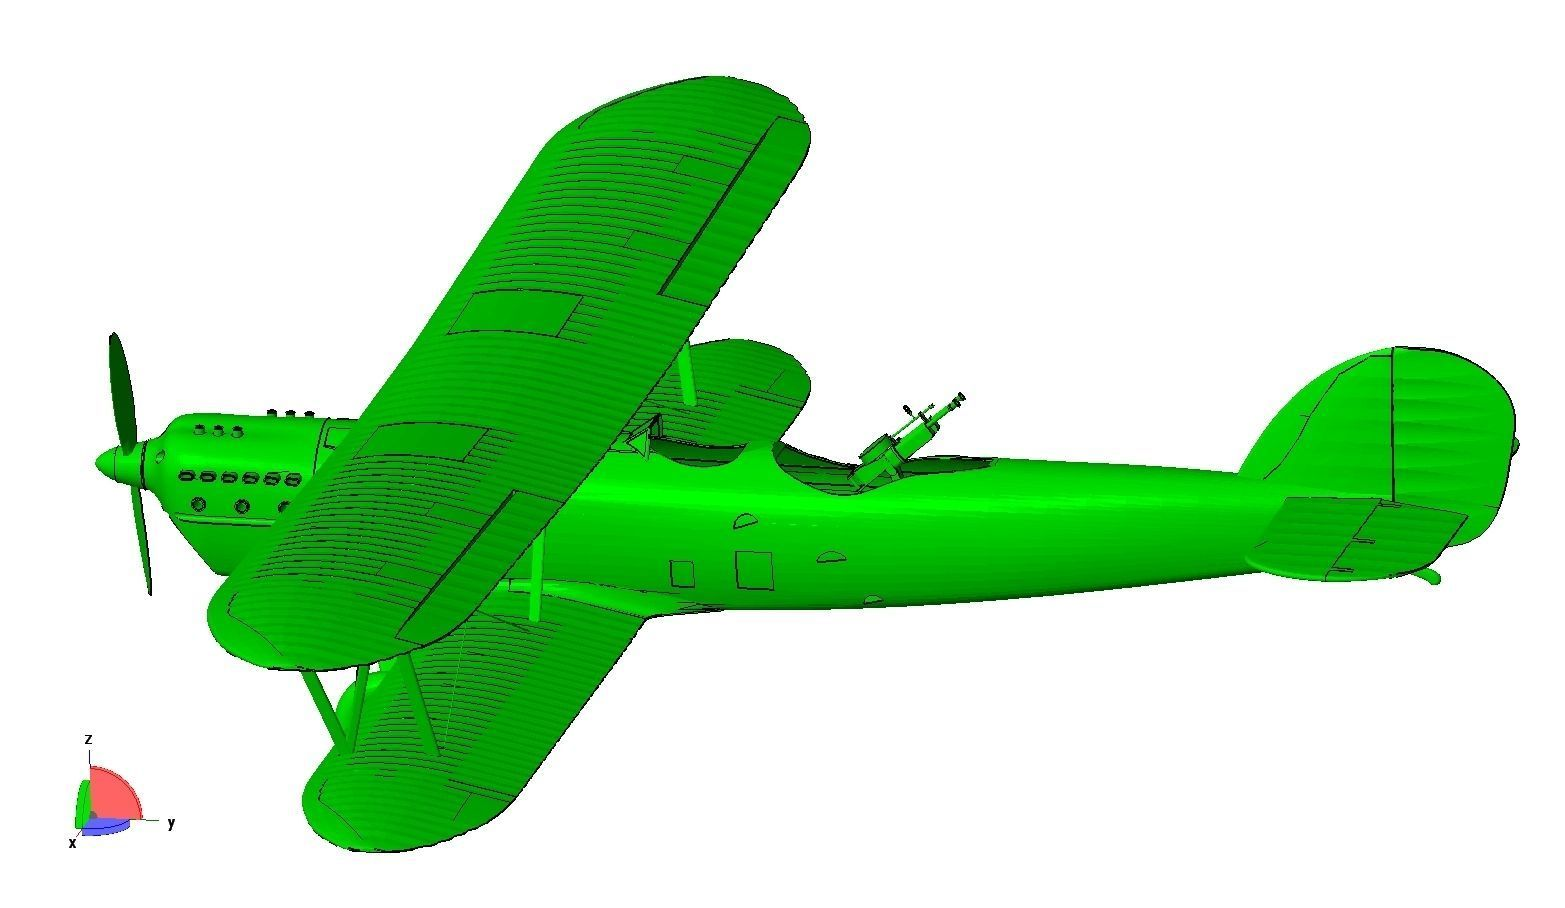 Aero A-101 biplane